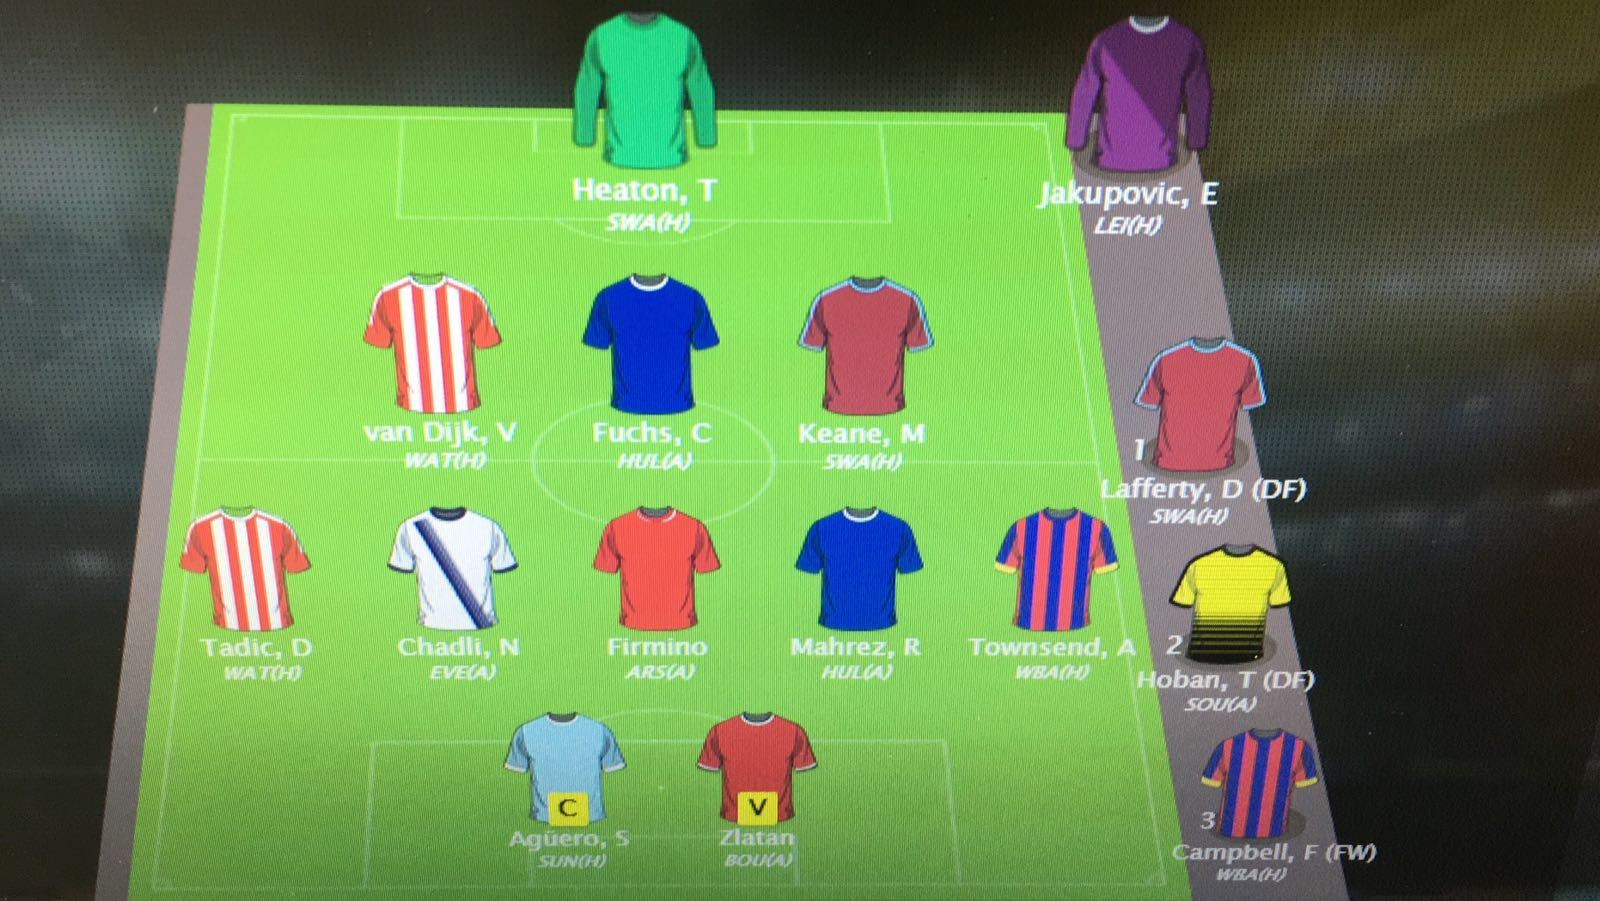 Sjons Fantasy Football Team voor Premier League speelronde 1